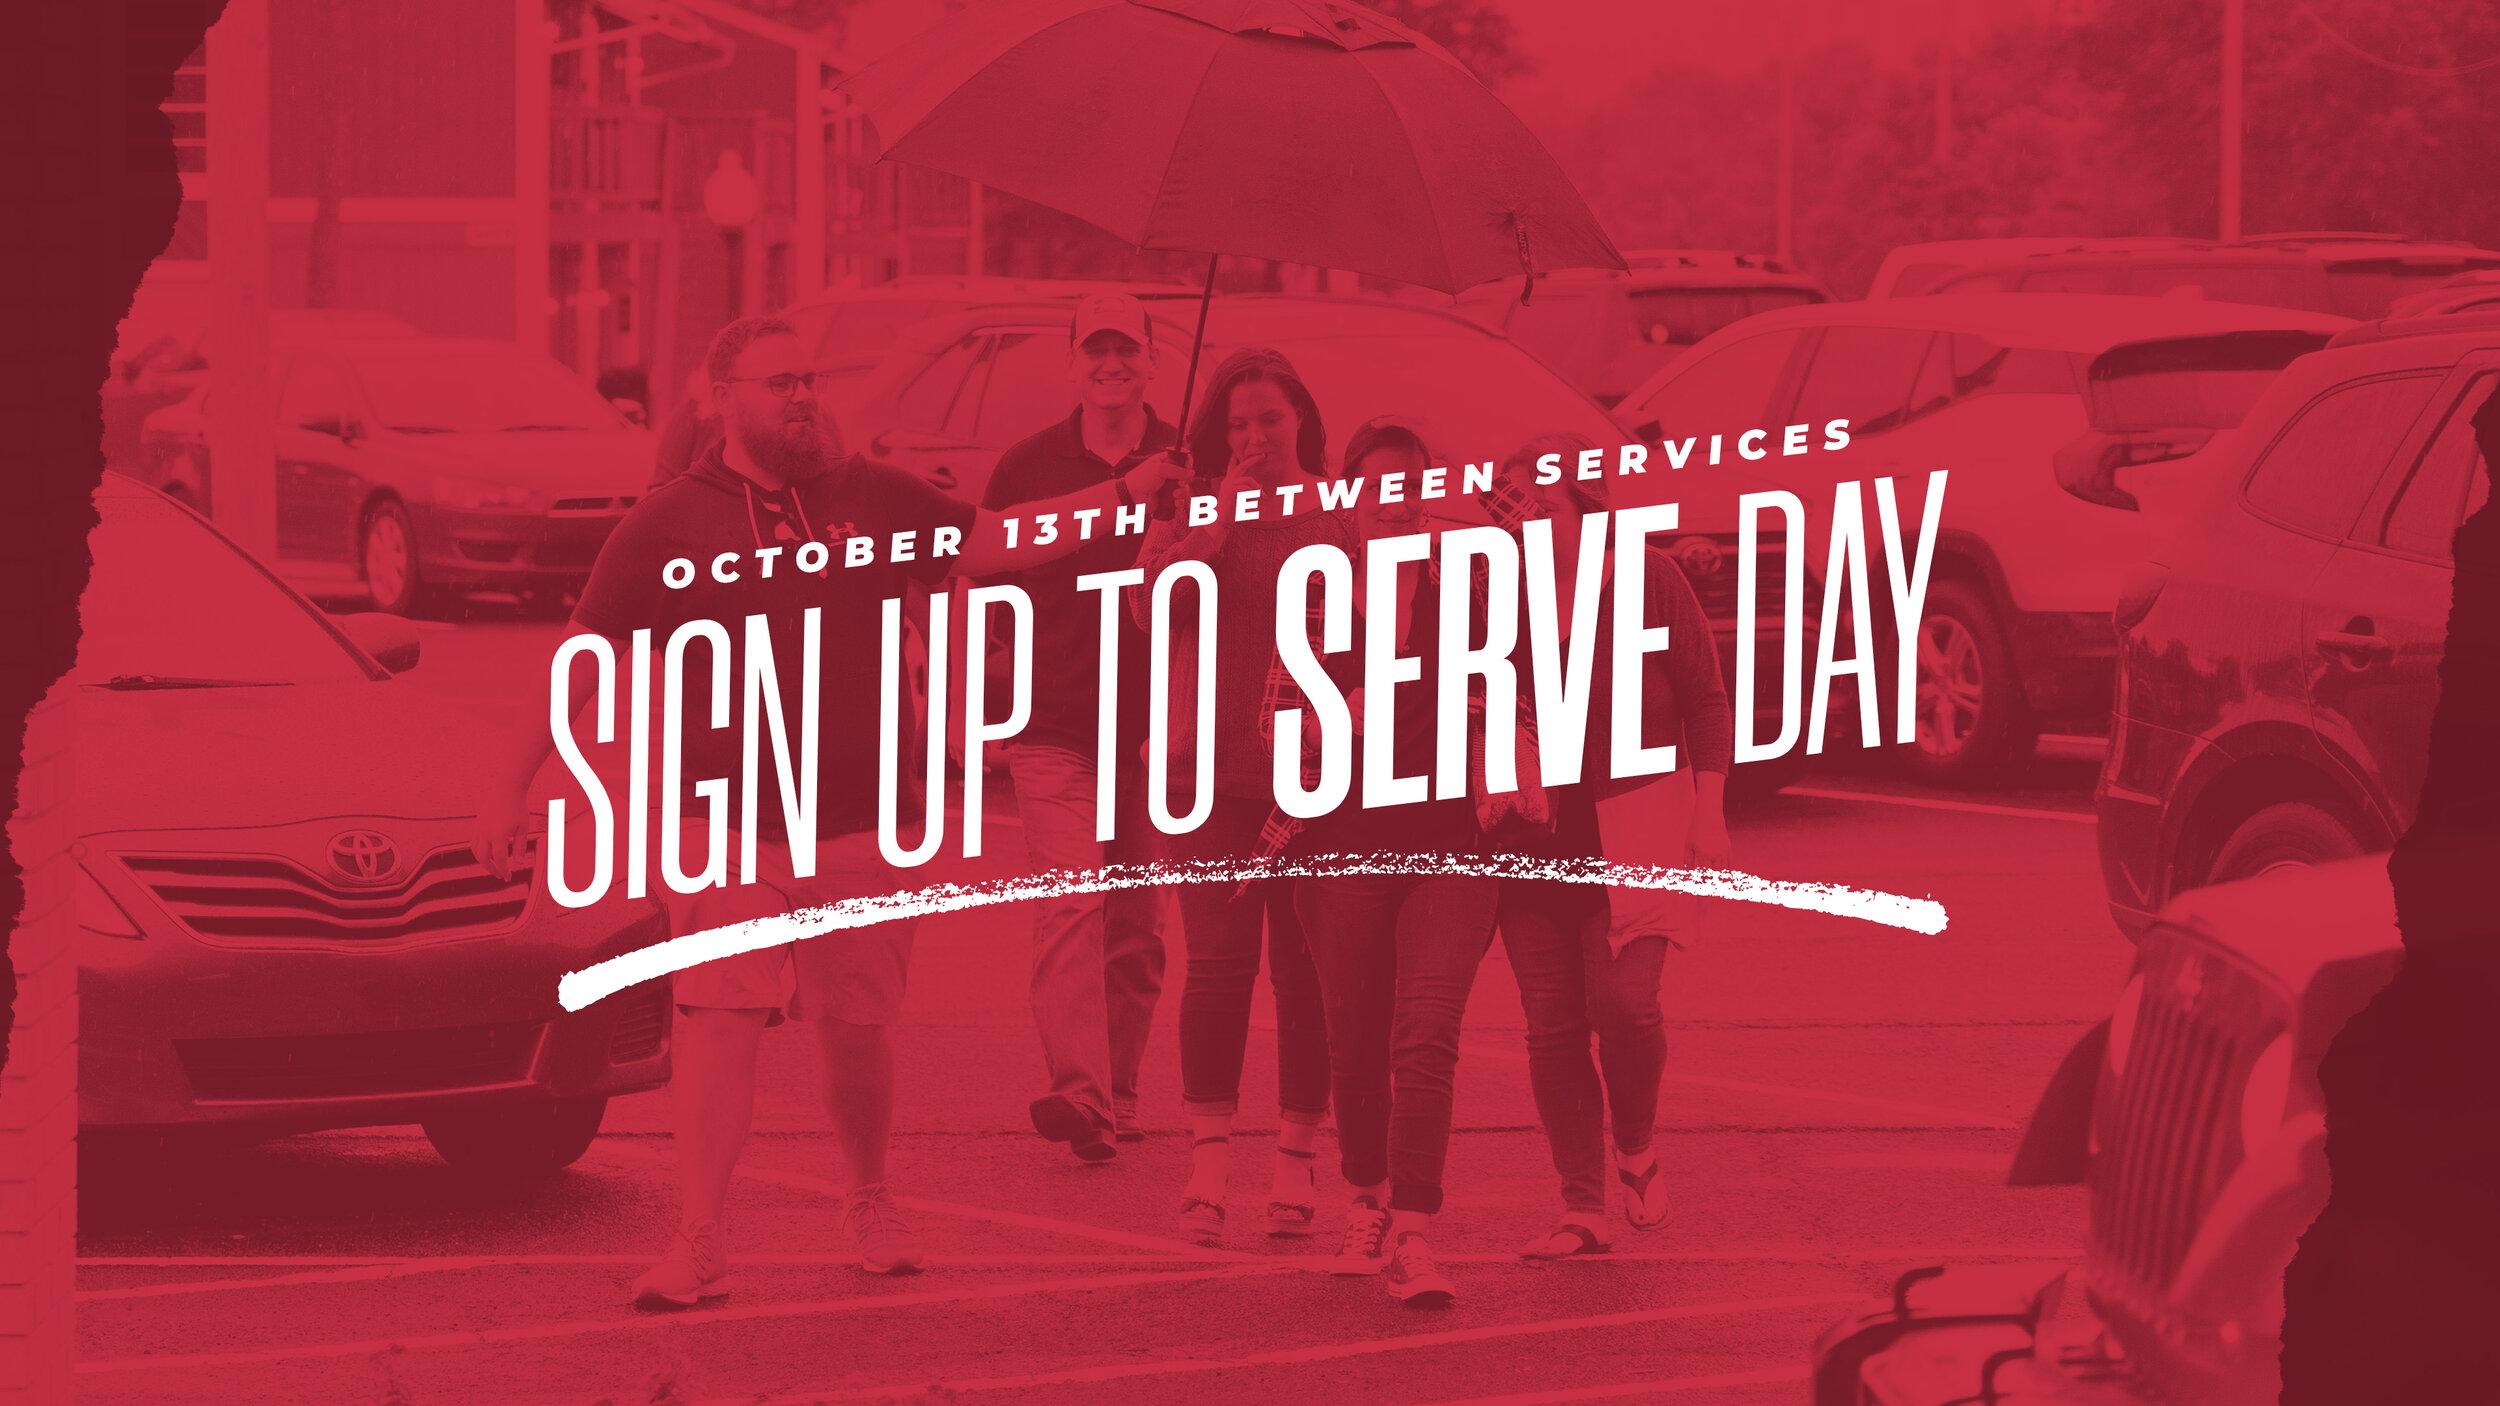 Sign up to Serve day_October 13.jpg